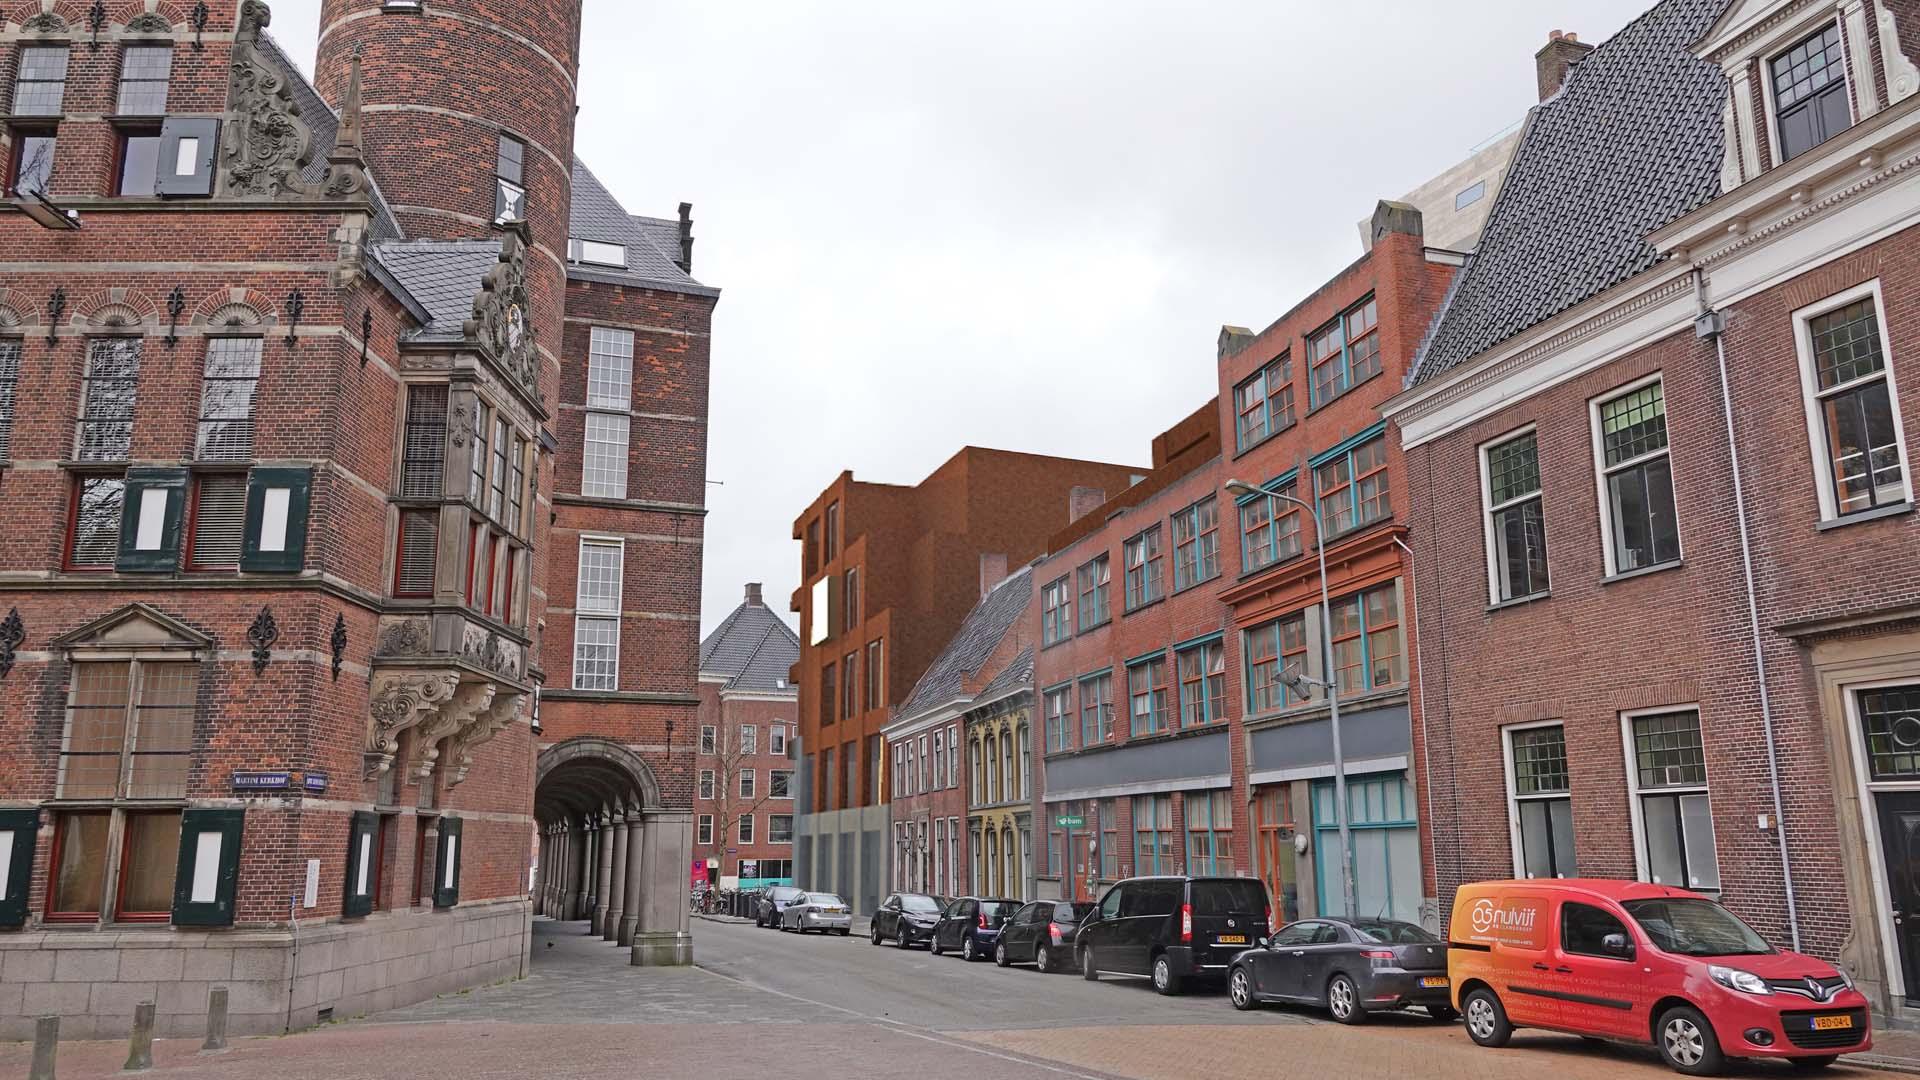 17080_Kunstencentrum Vrijdag Groningen_02